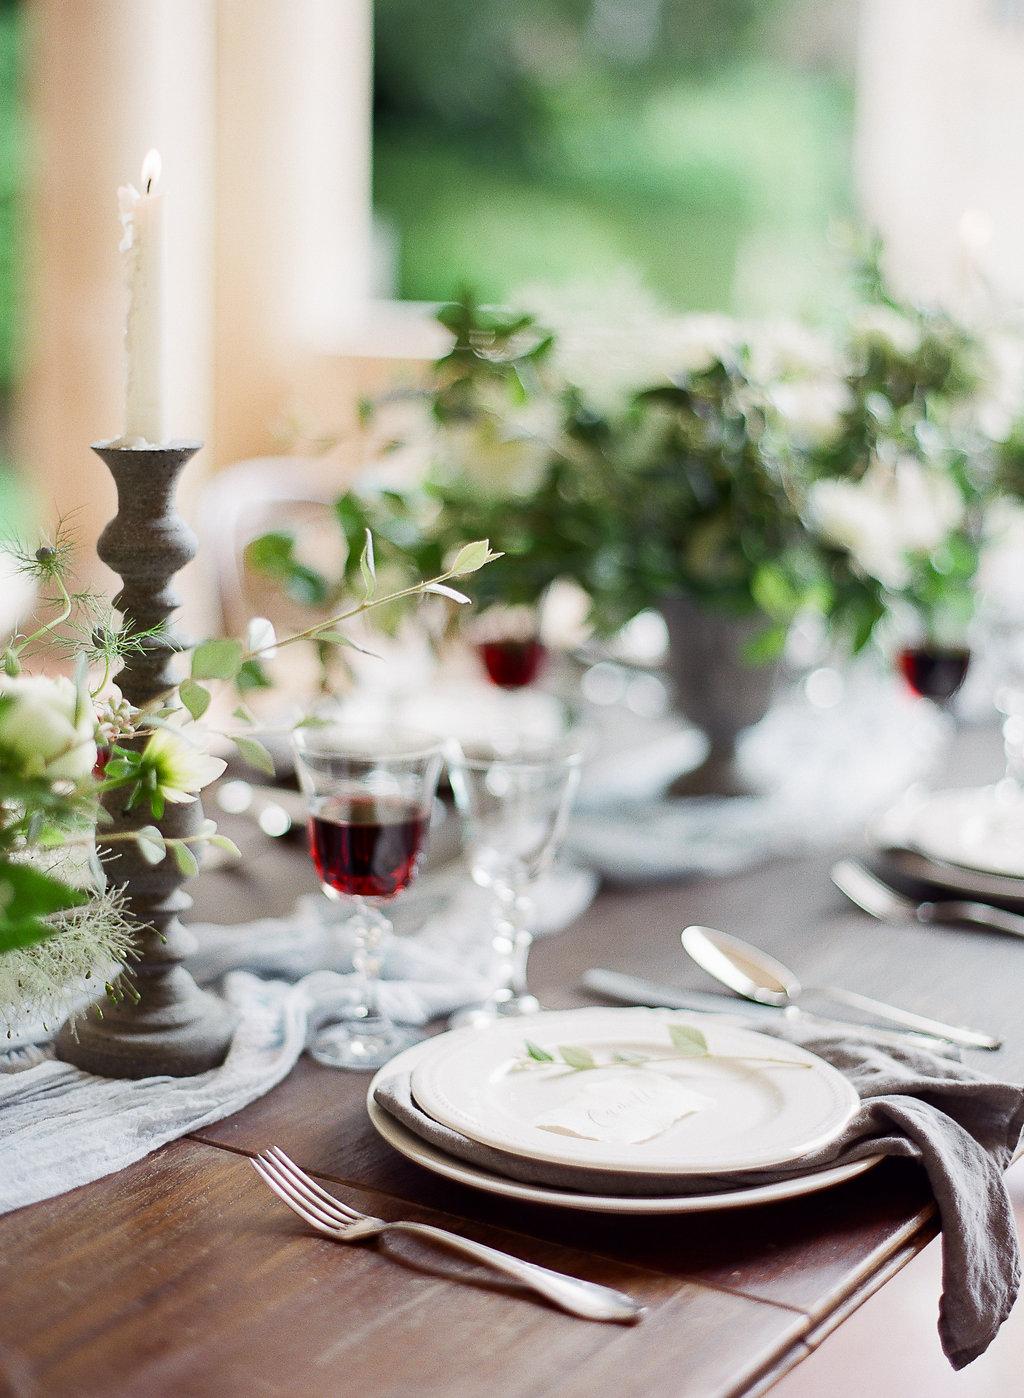 Verona-Destination-Wedding-Inspiration-by-Kibogo-Photography43.jpg